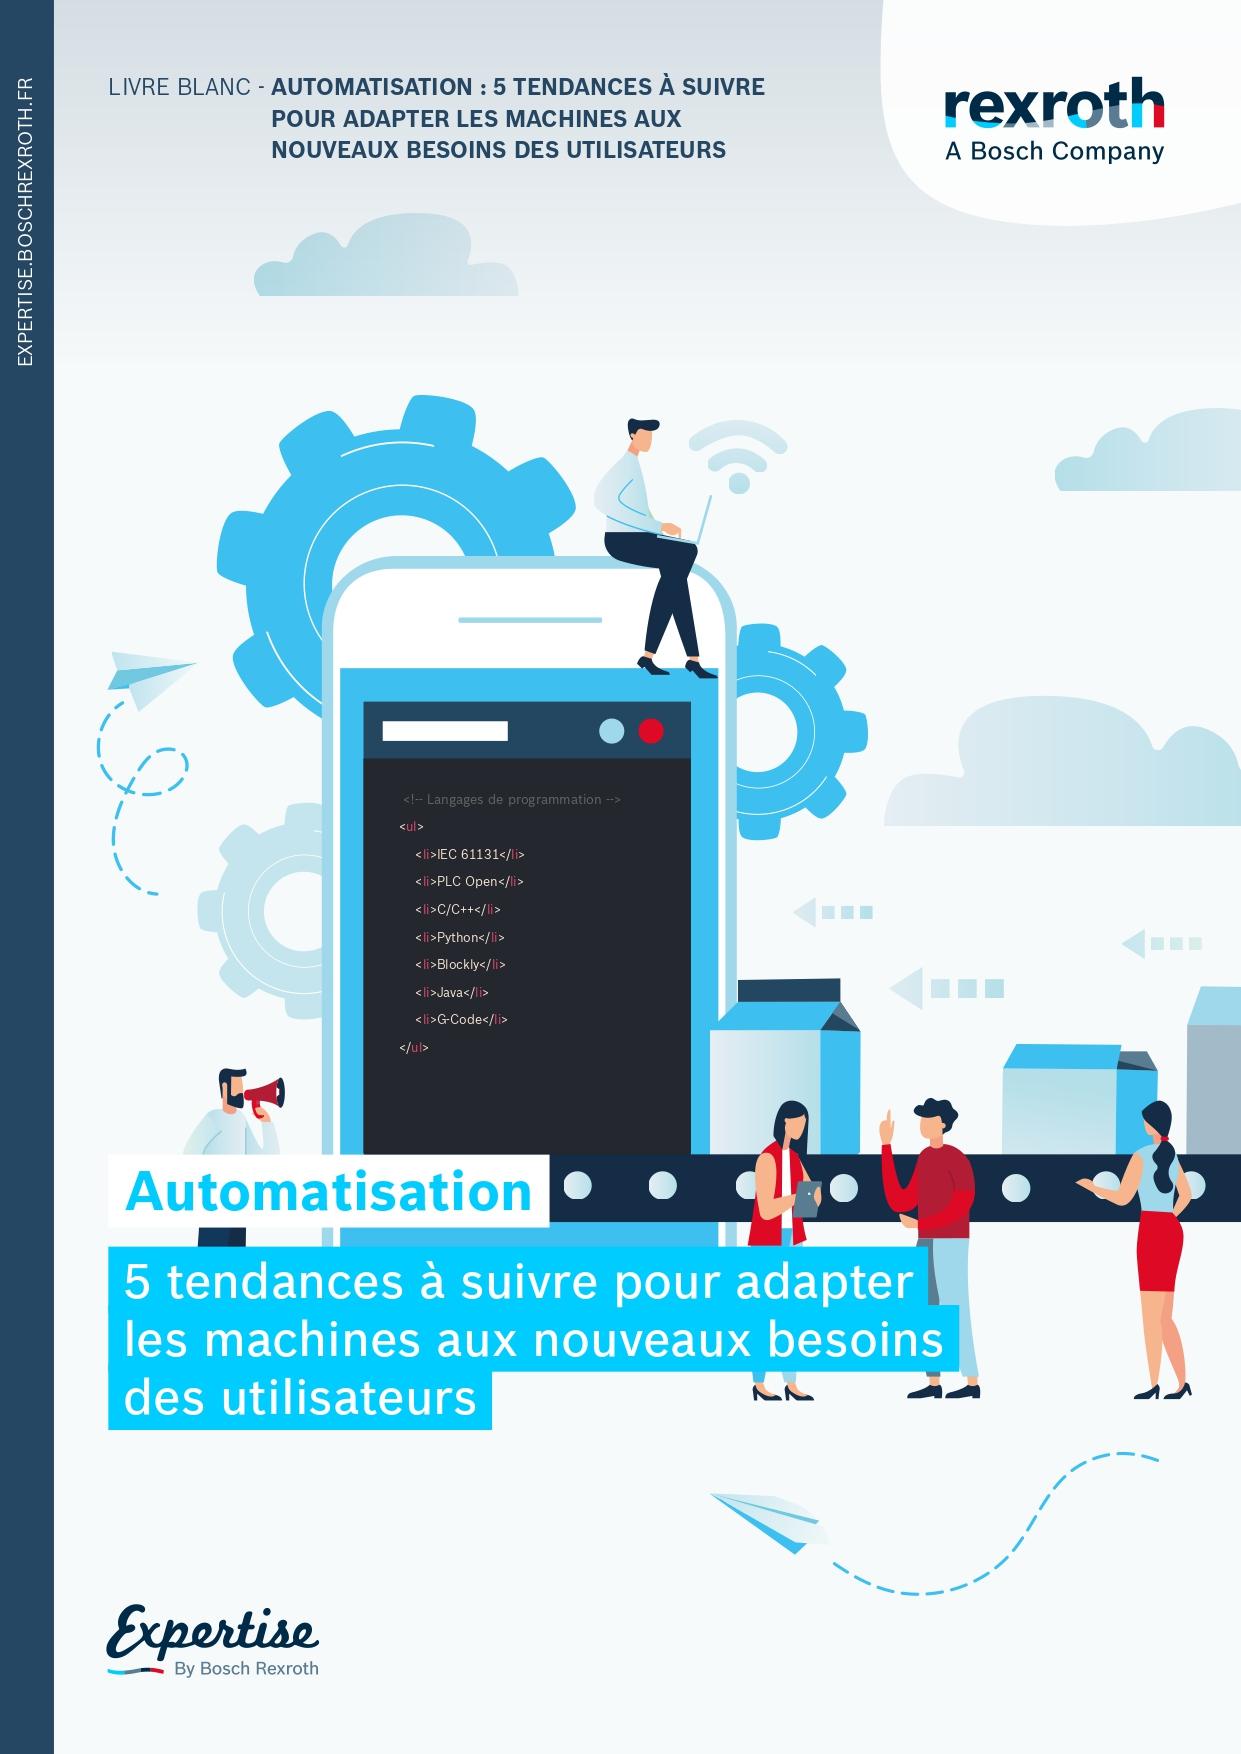 Automatisation : Bosch Rexroth publie son livre blanc